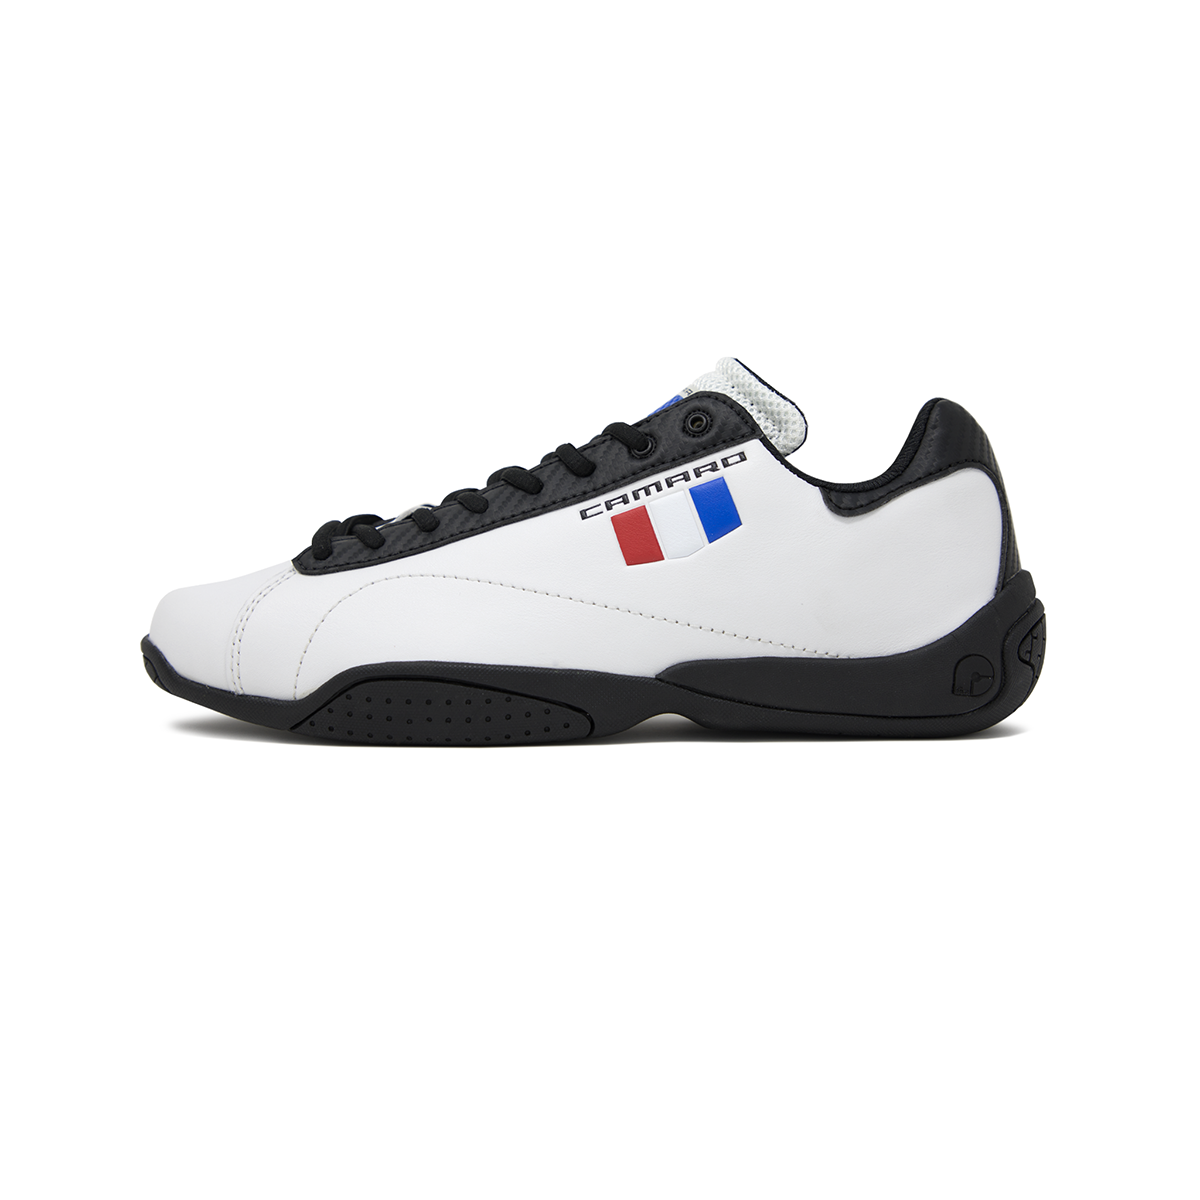 Camaro Shoes | Camaro Driving Shoes-ChevyMall